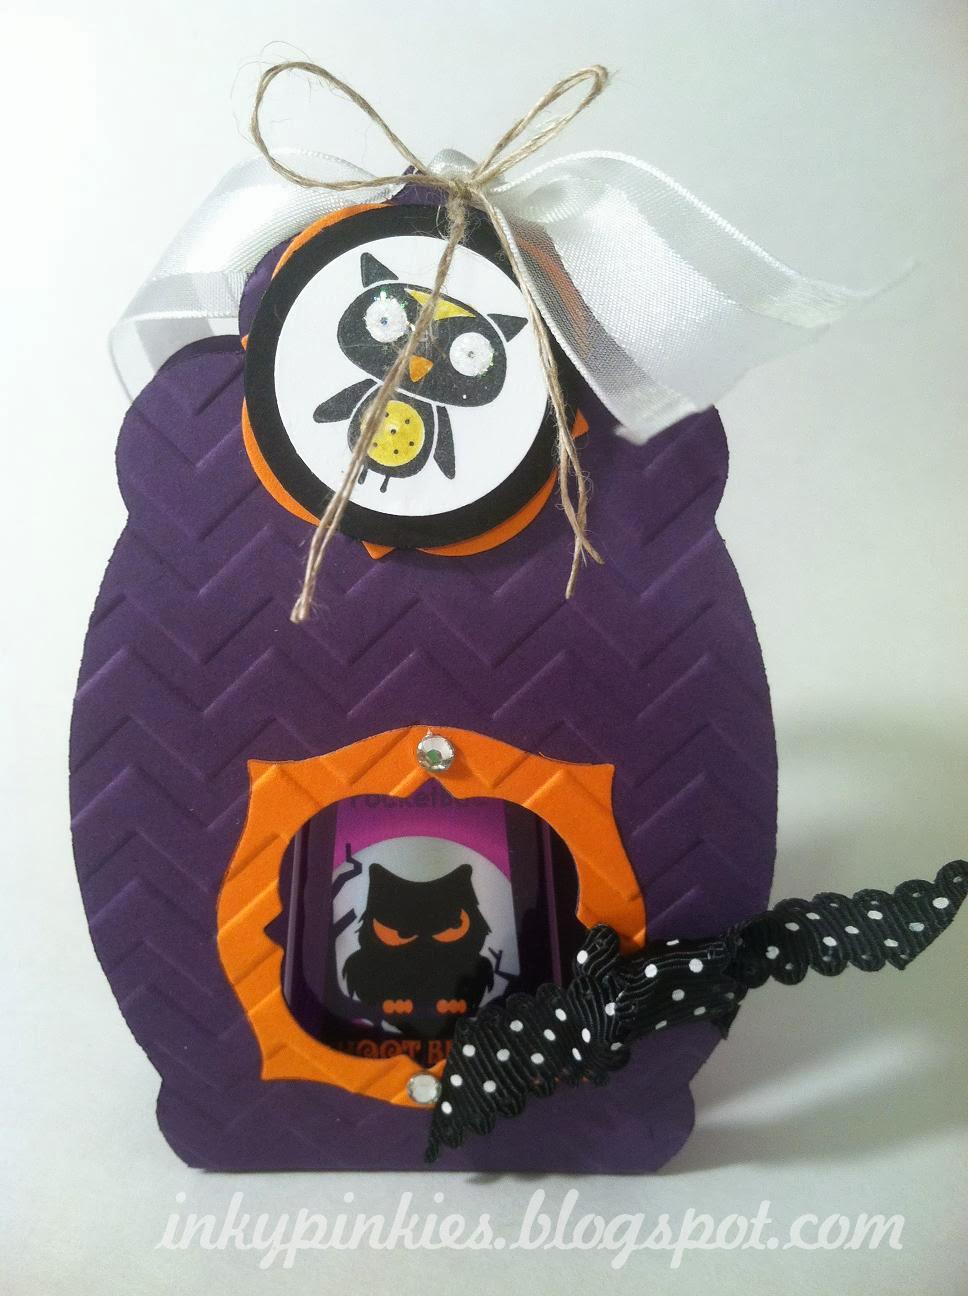 Inkypinkies Happy Halloween Hand Sanitizer Holders For